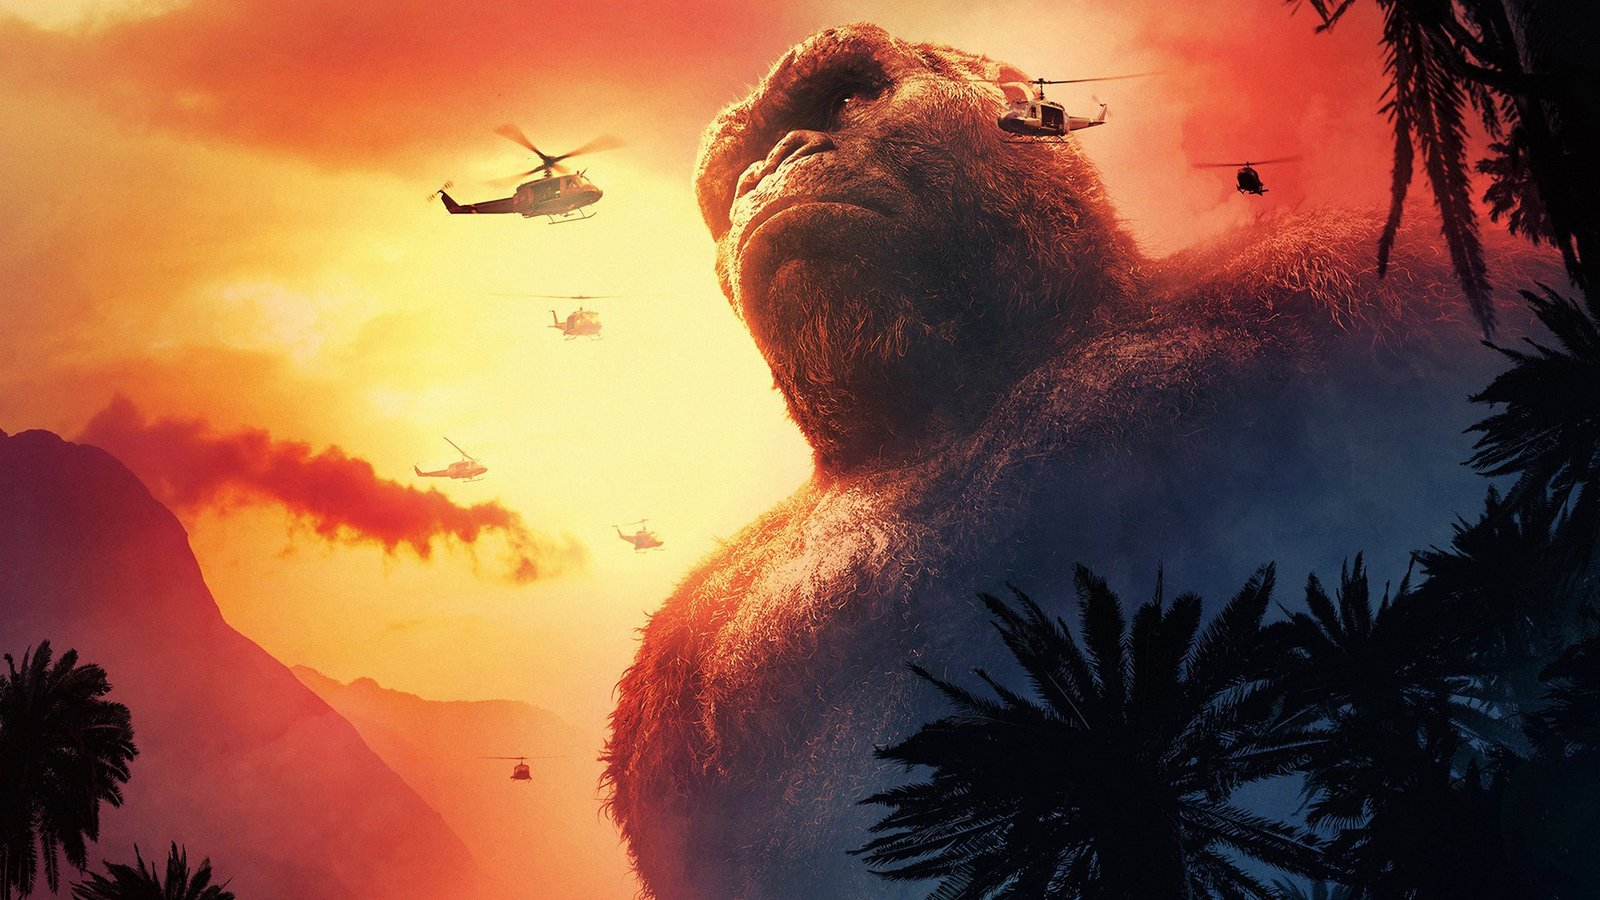 / Kong: Skull Island